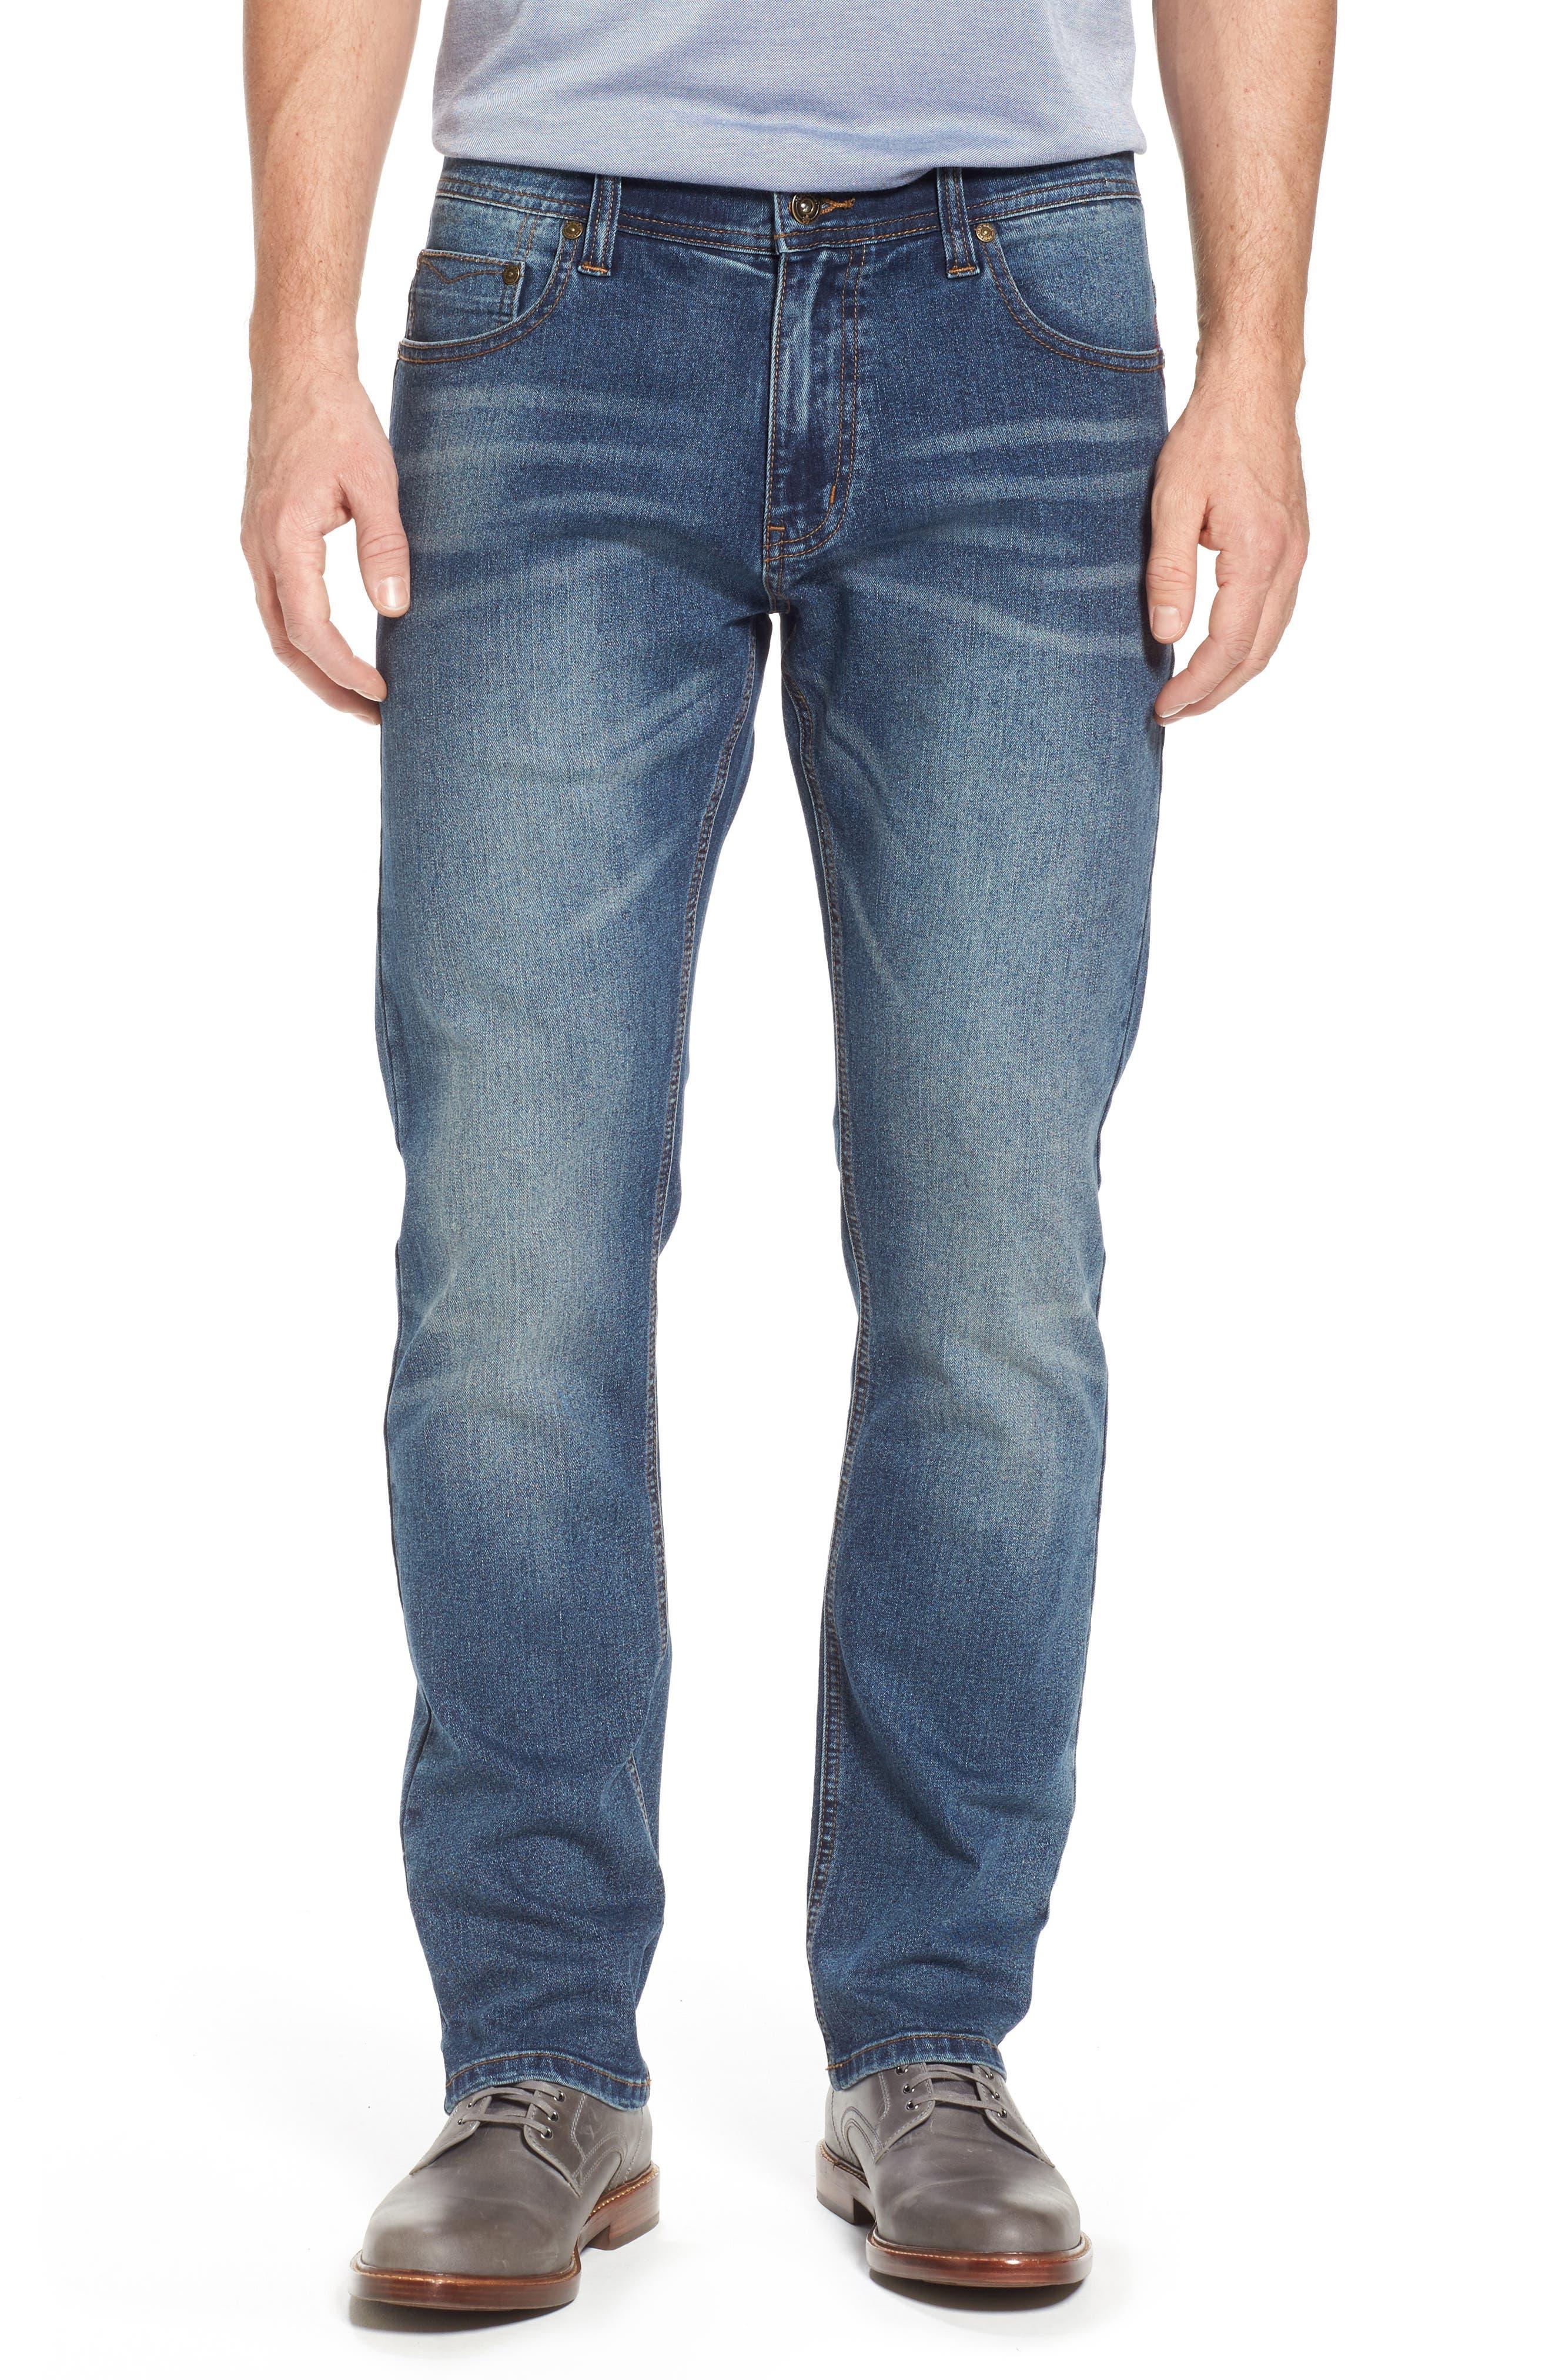 Maverick Stretch Slim Fit Jeans,                             Main thumbnail 1, color,                             MAVERICK WASH